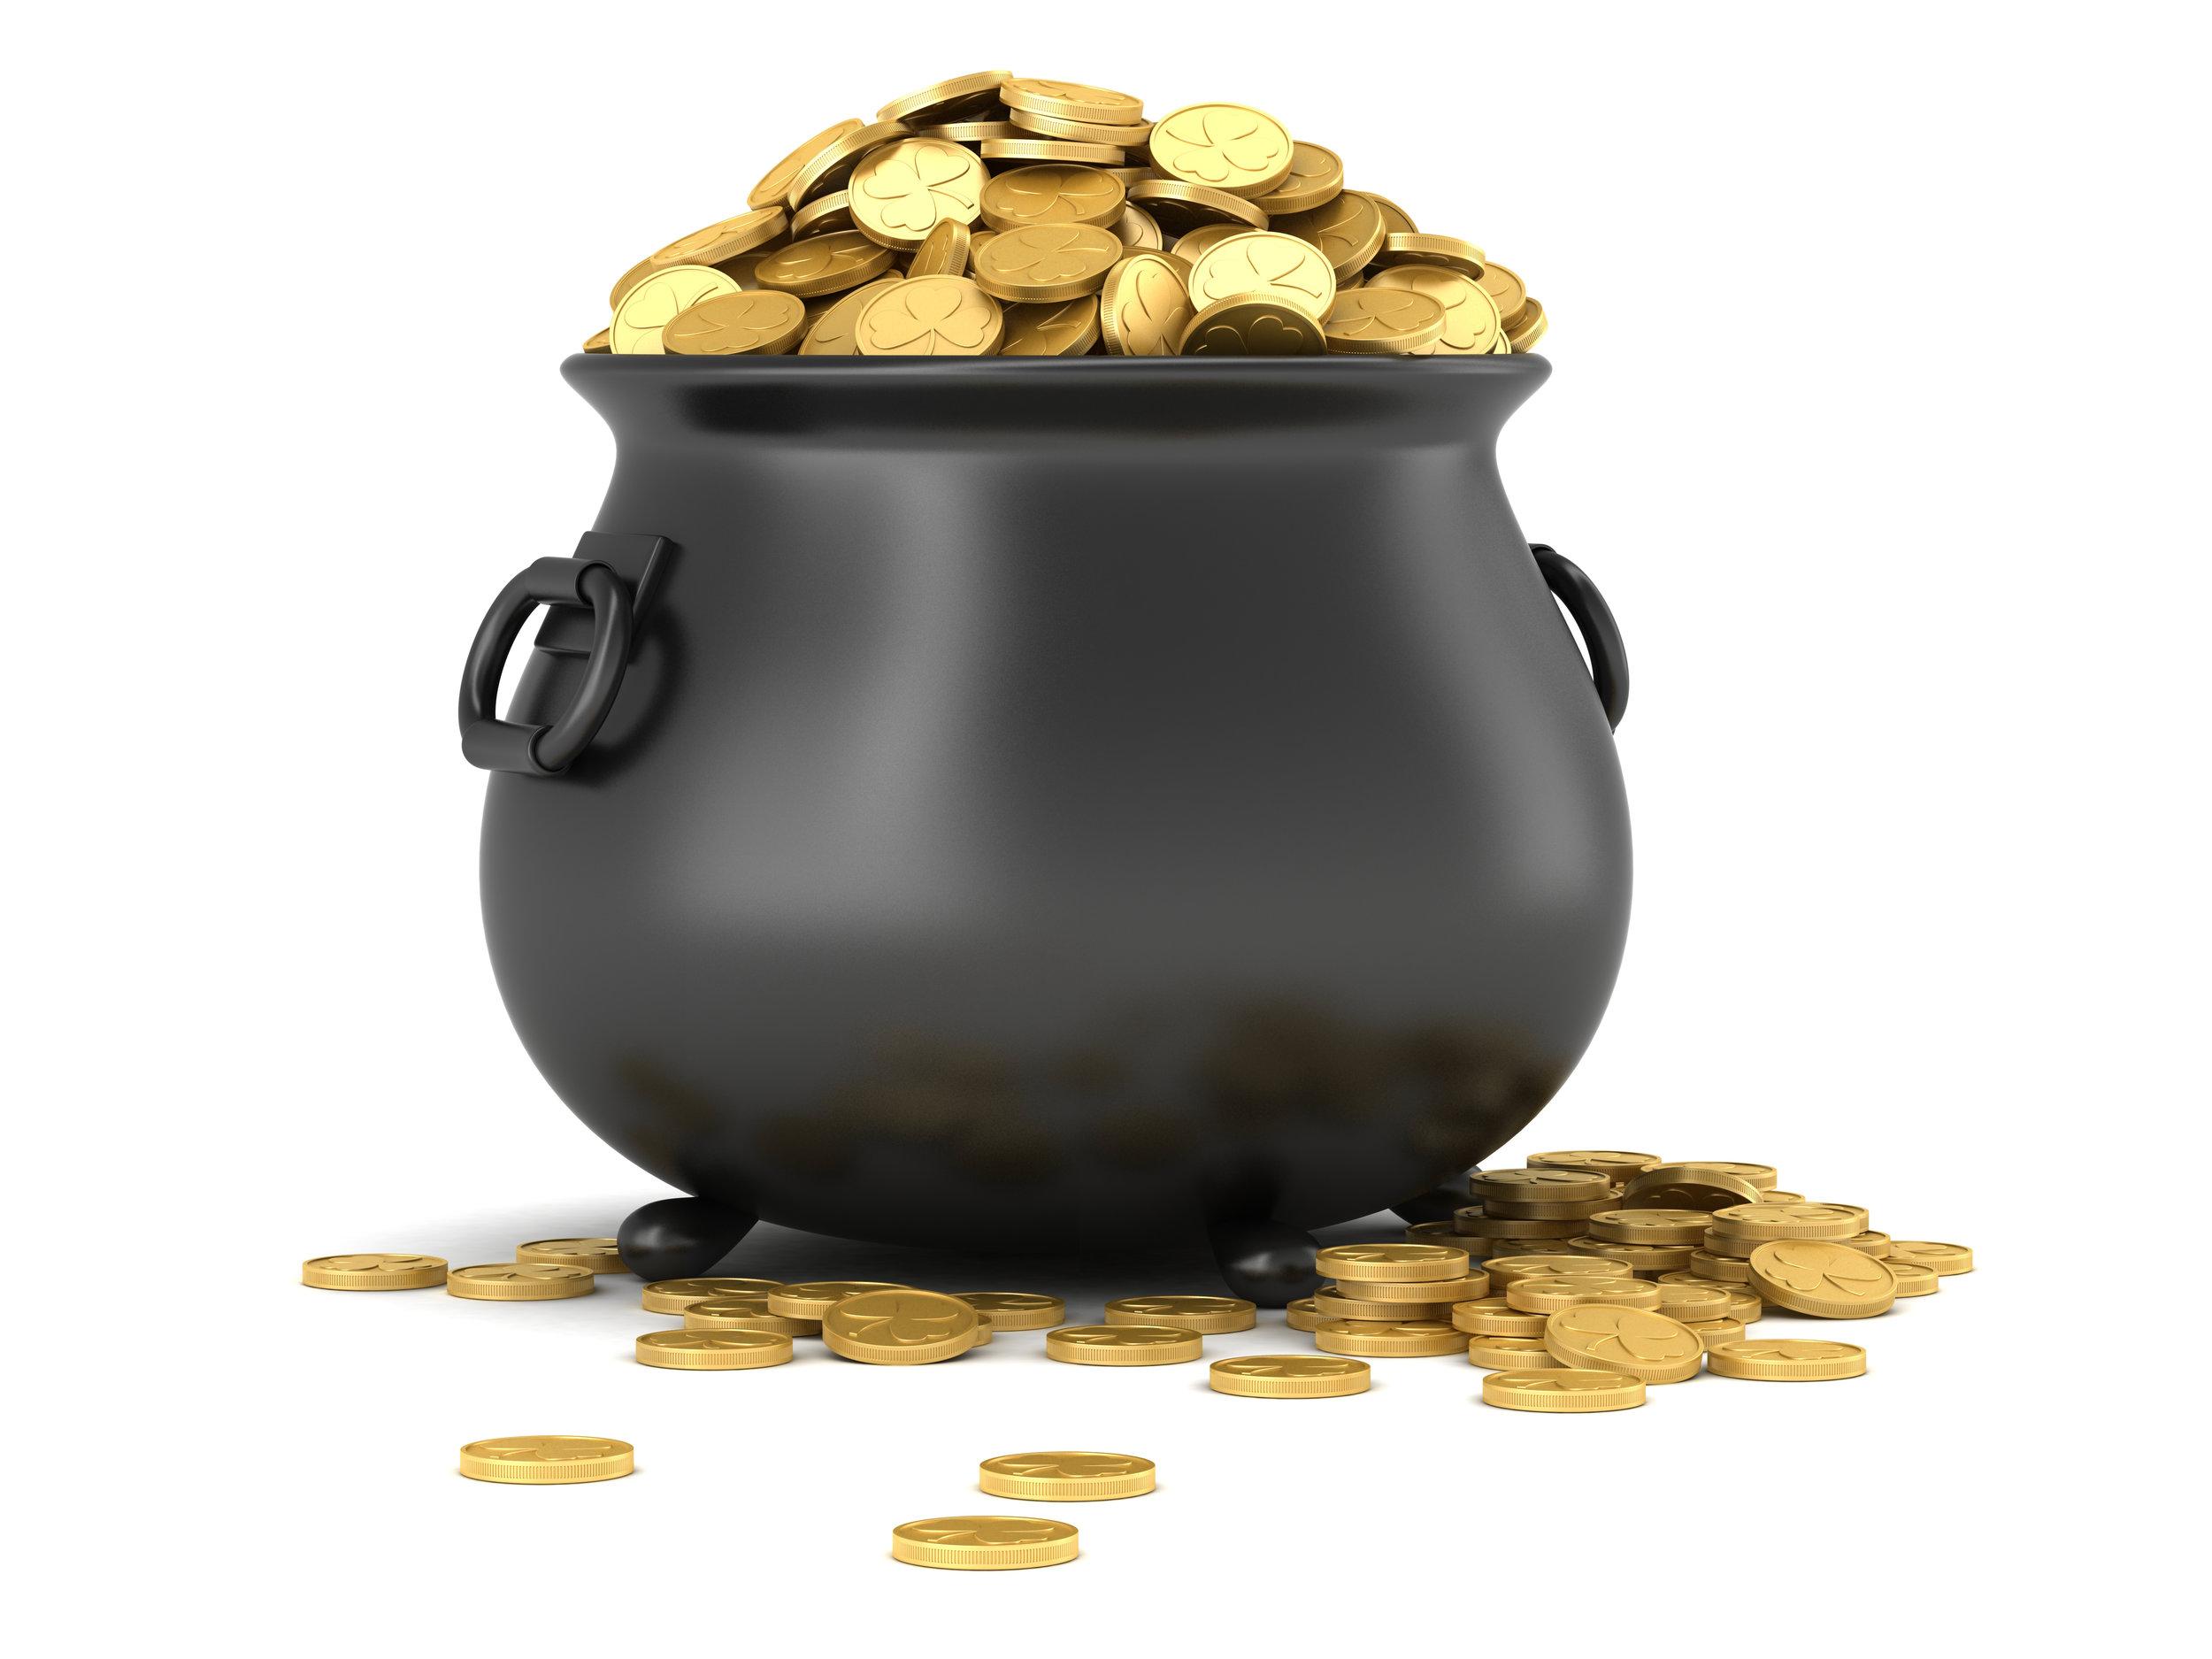 Pot of Gold_138649637.jpeg